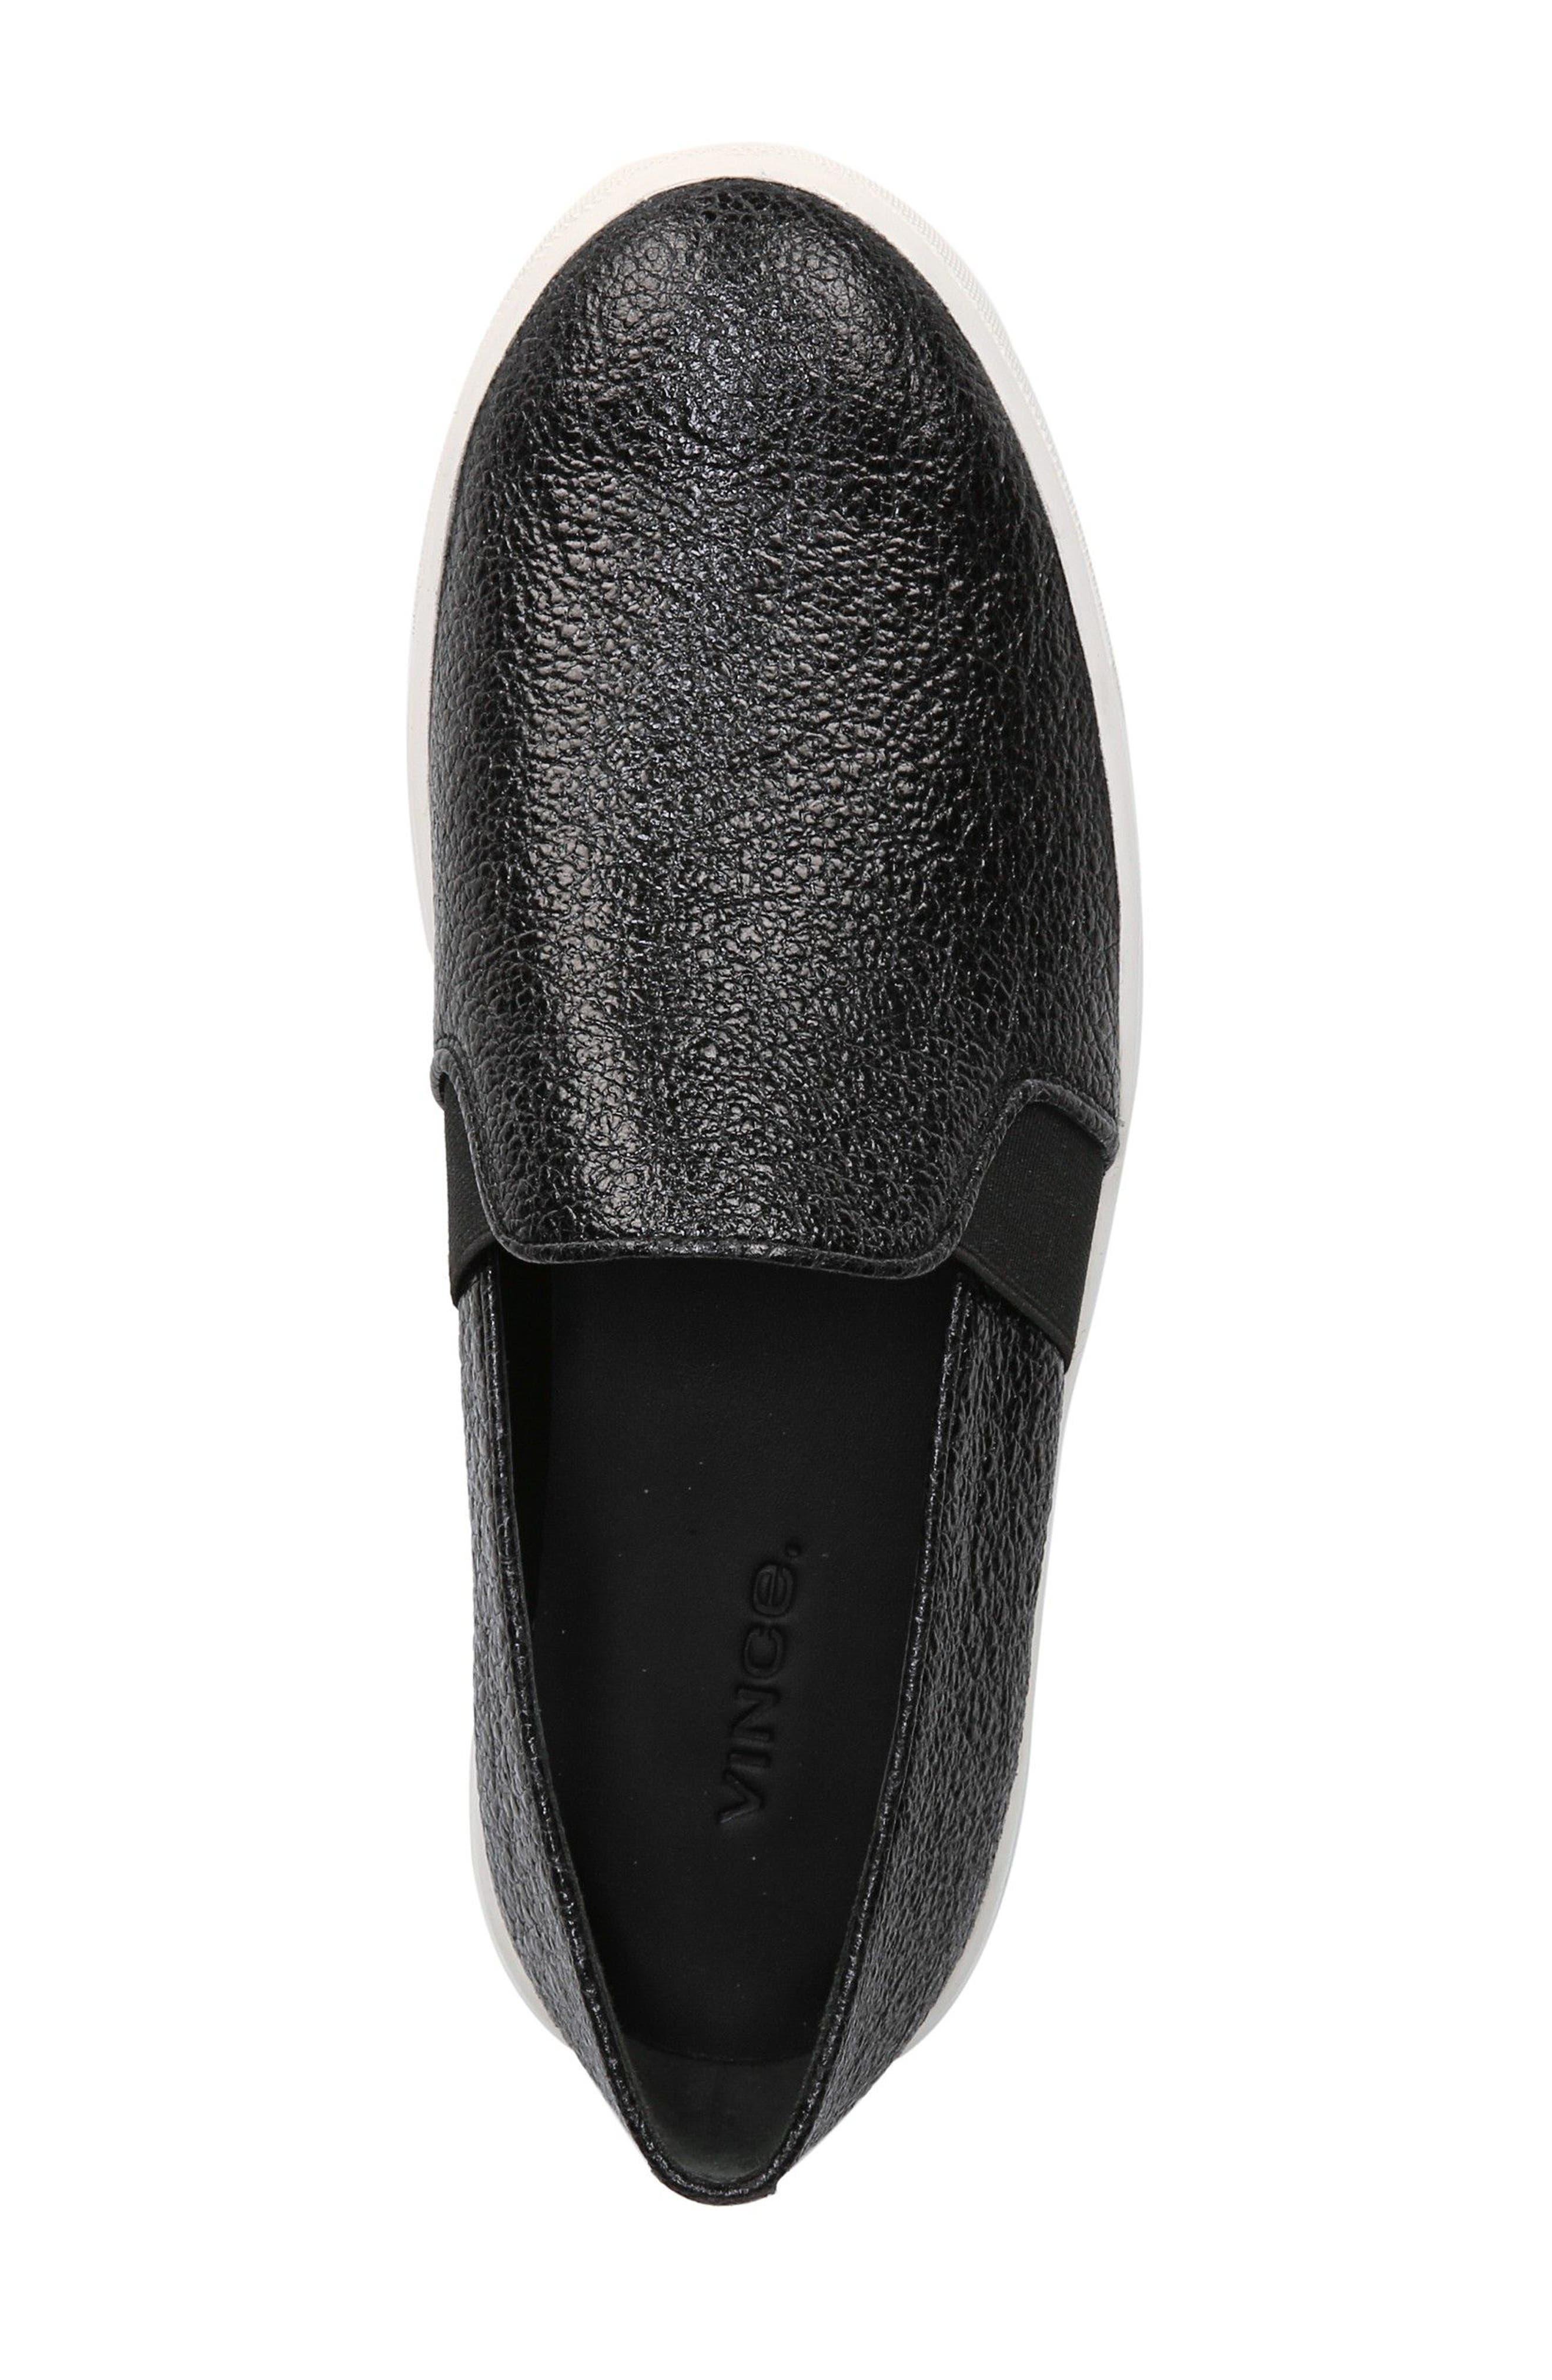 'Blair 12' Leather Slip-On Sneaker,                             Alternate thumbnail 4, color,                             BLACK LEATHER